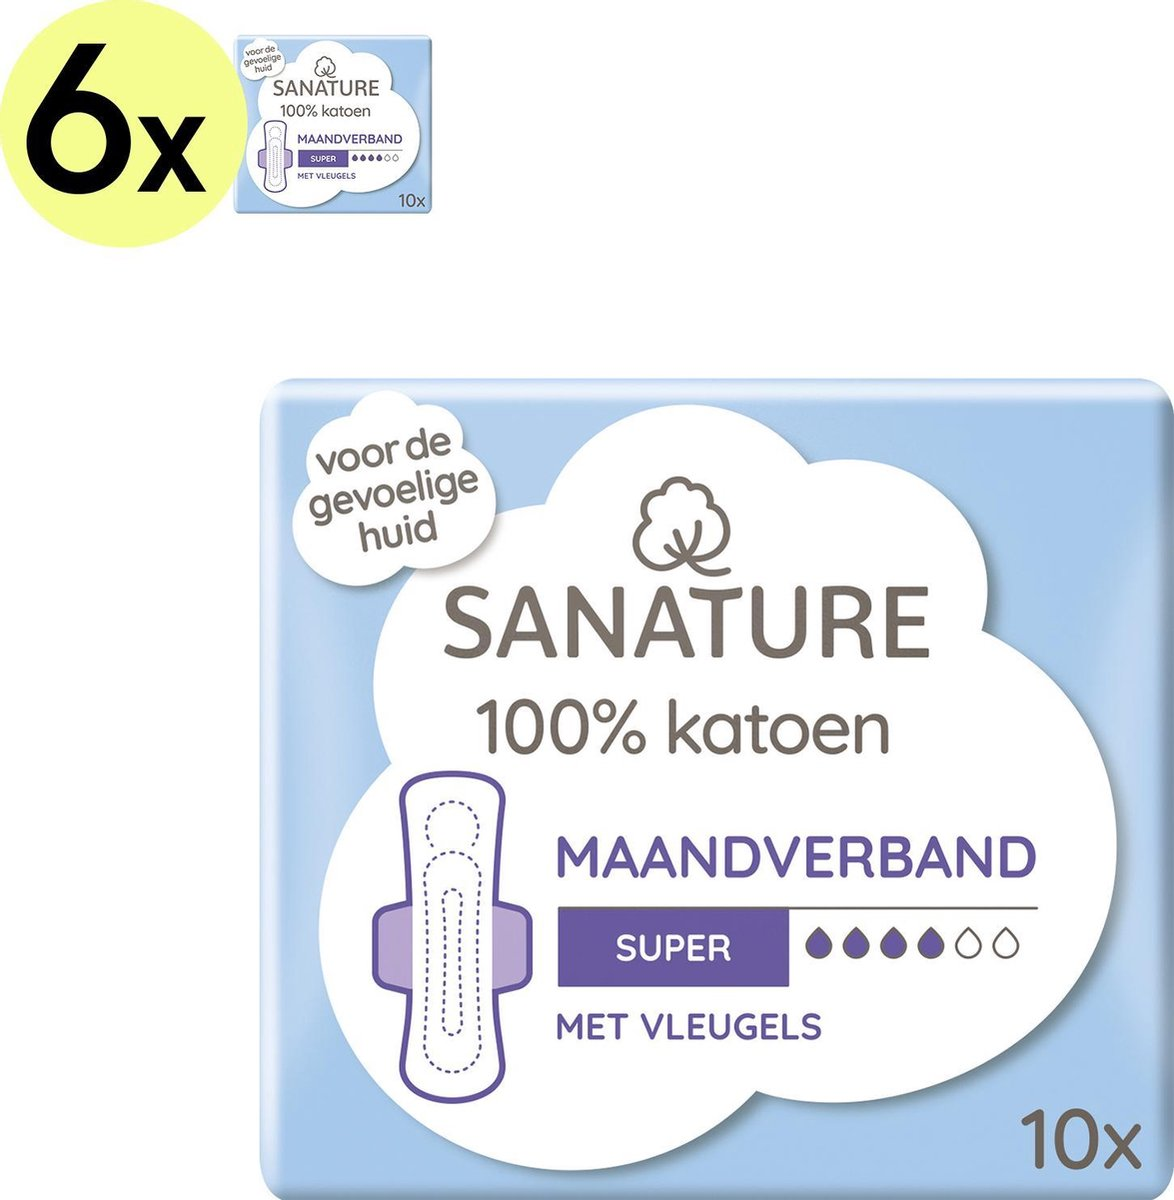 Sanature 100% Katoenen Maandverband Super met vleugels 6 x 10 stuks